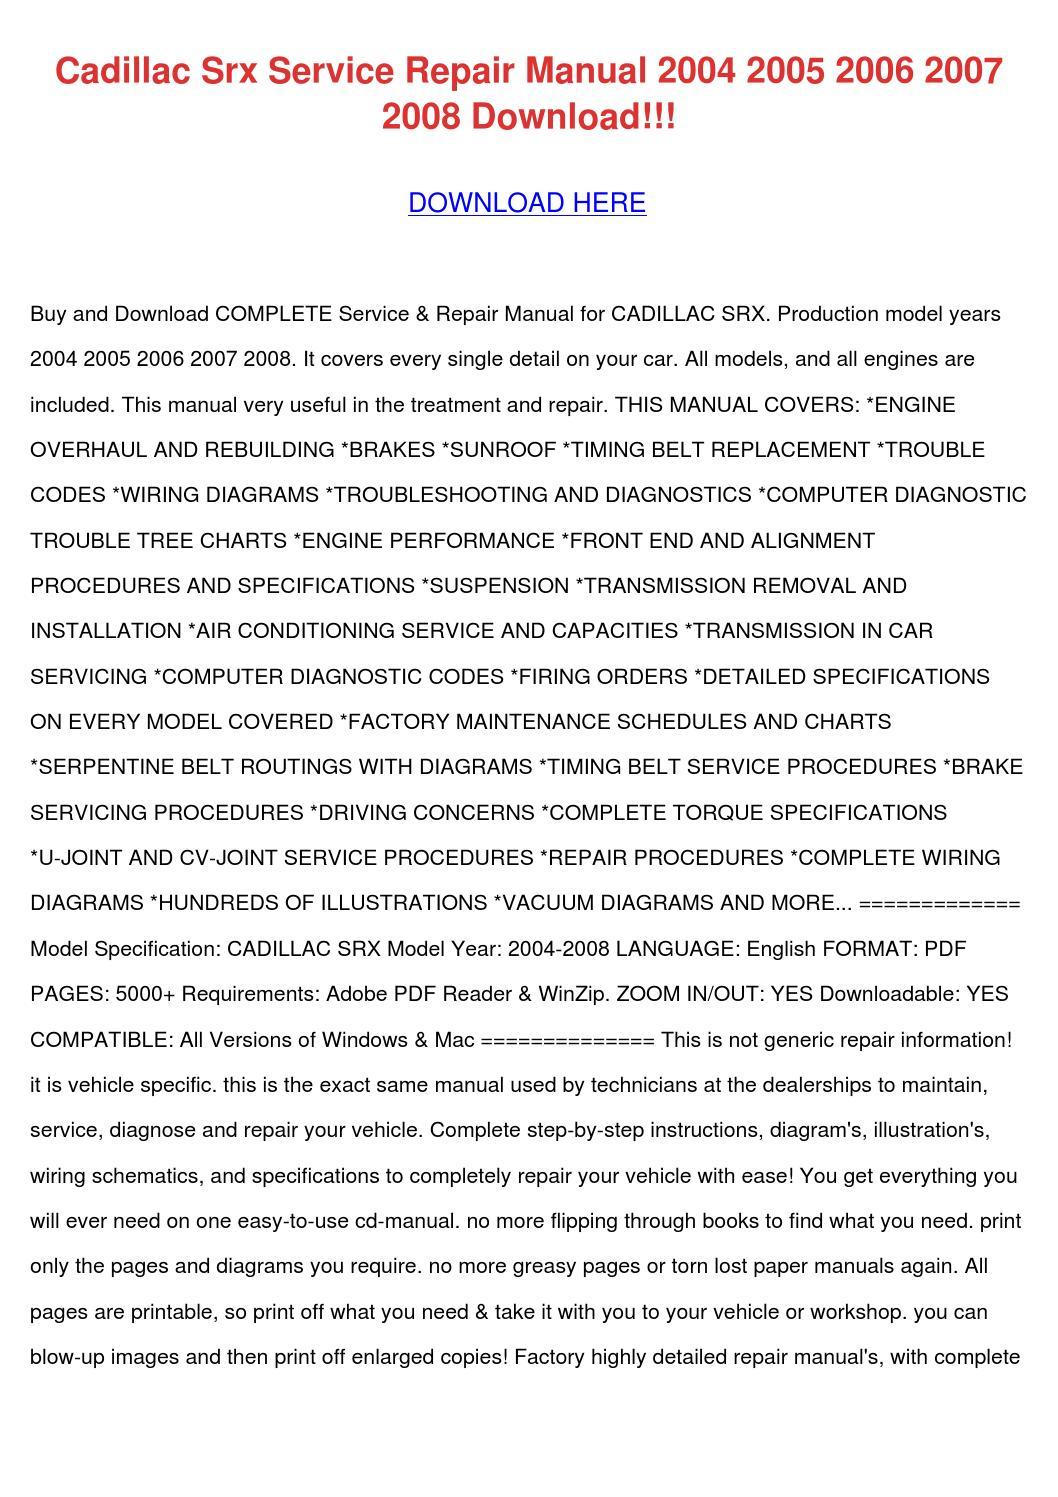 Cadillac Srx Service Repair Manual 2004 2005 By Lakeshakessler Issuu Xlr Wiring